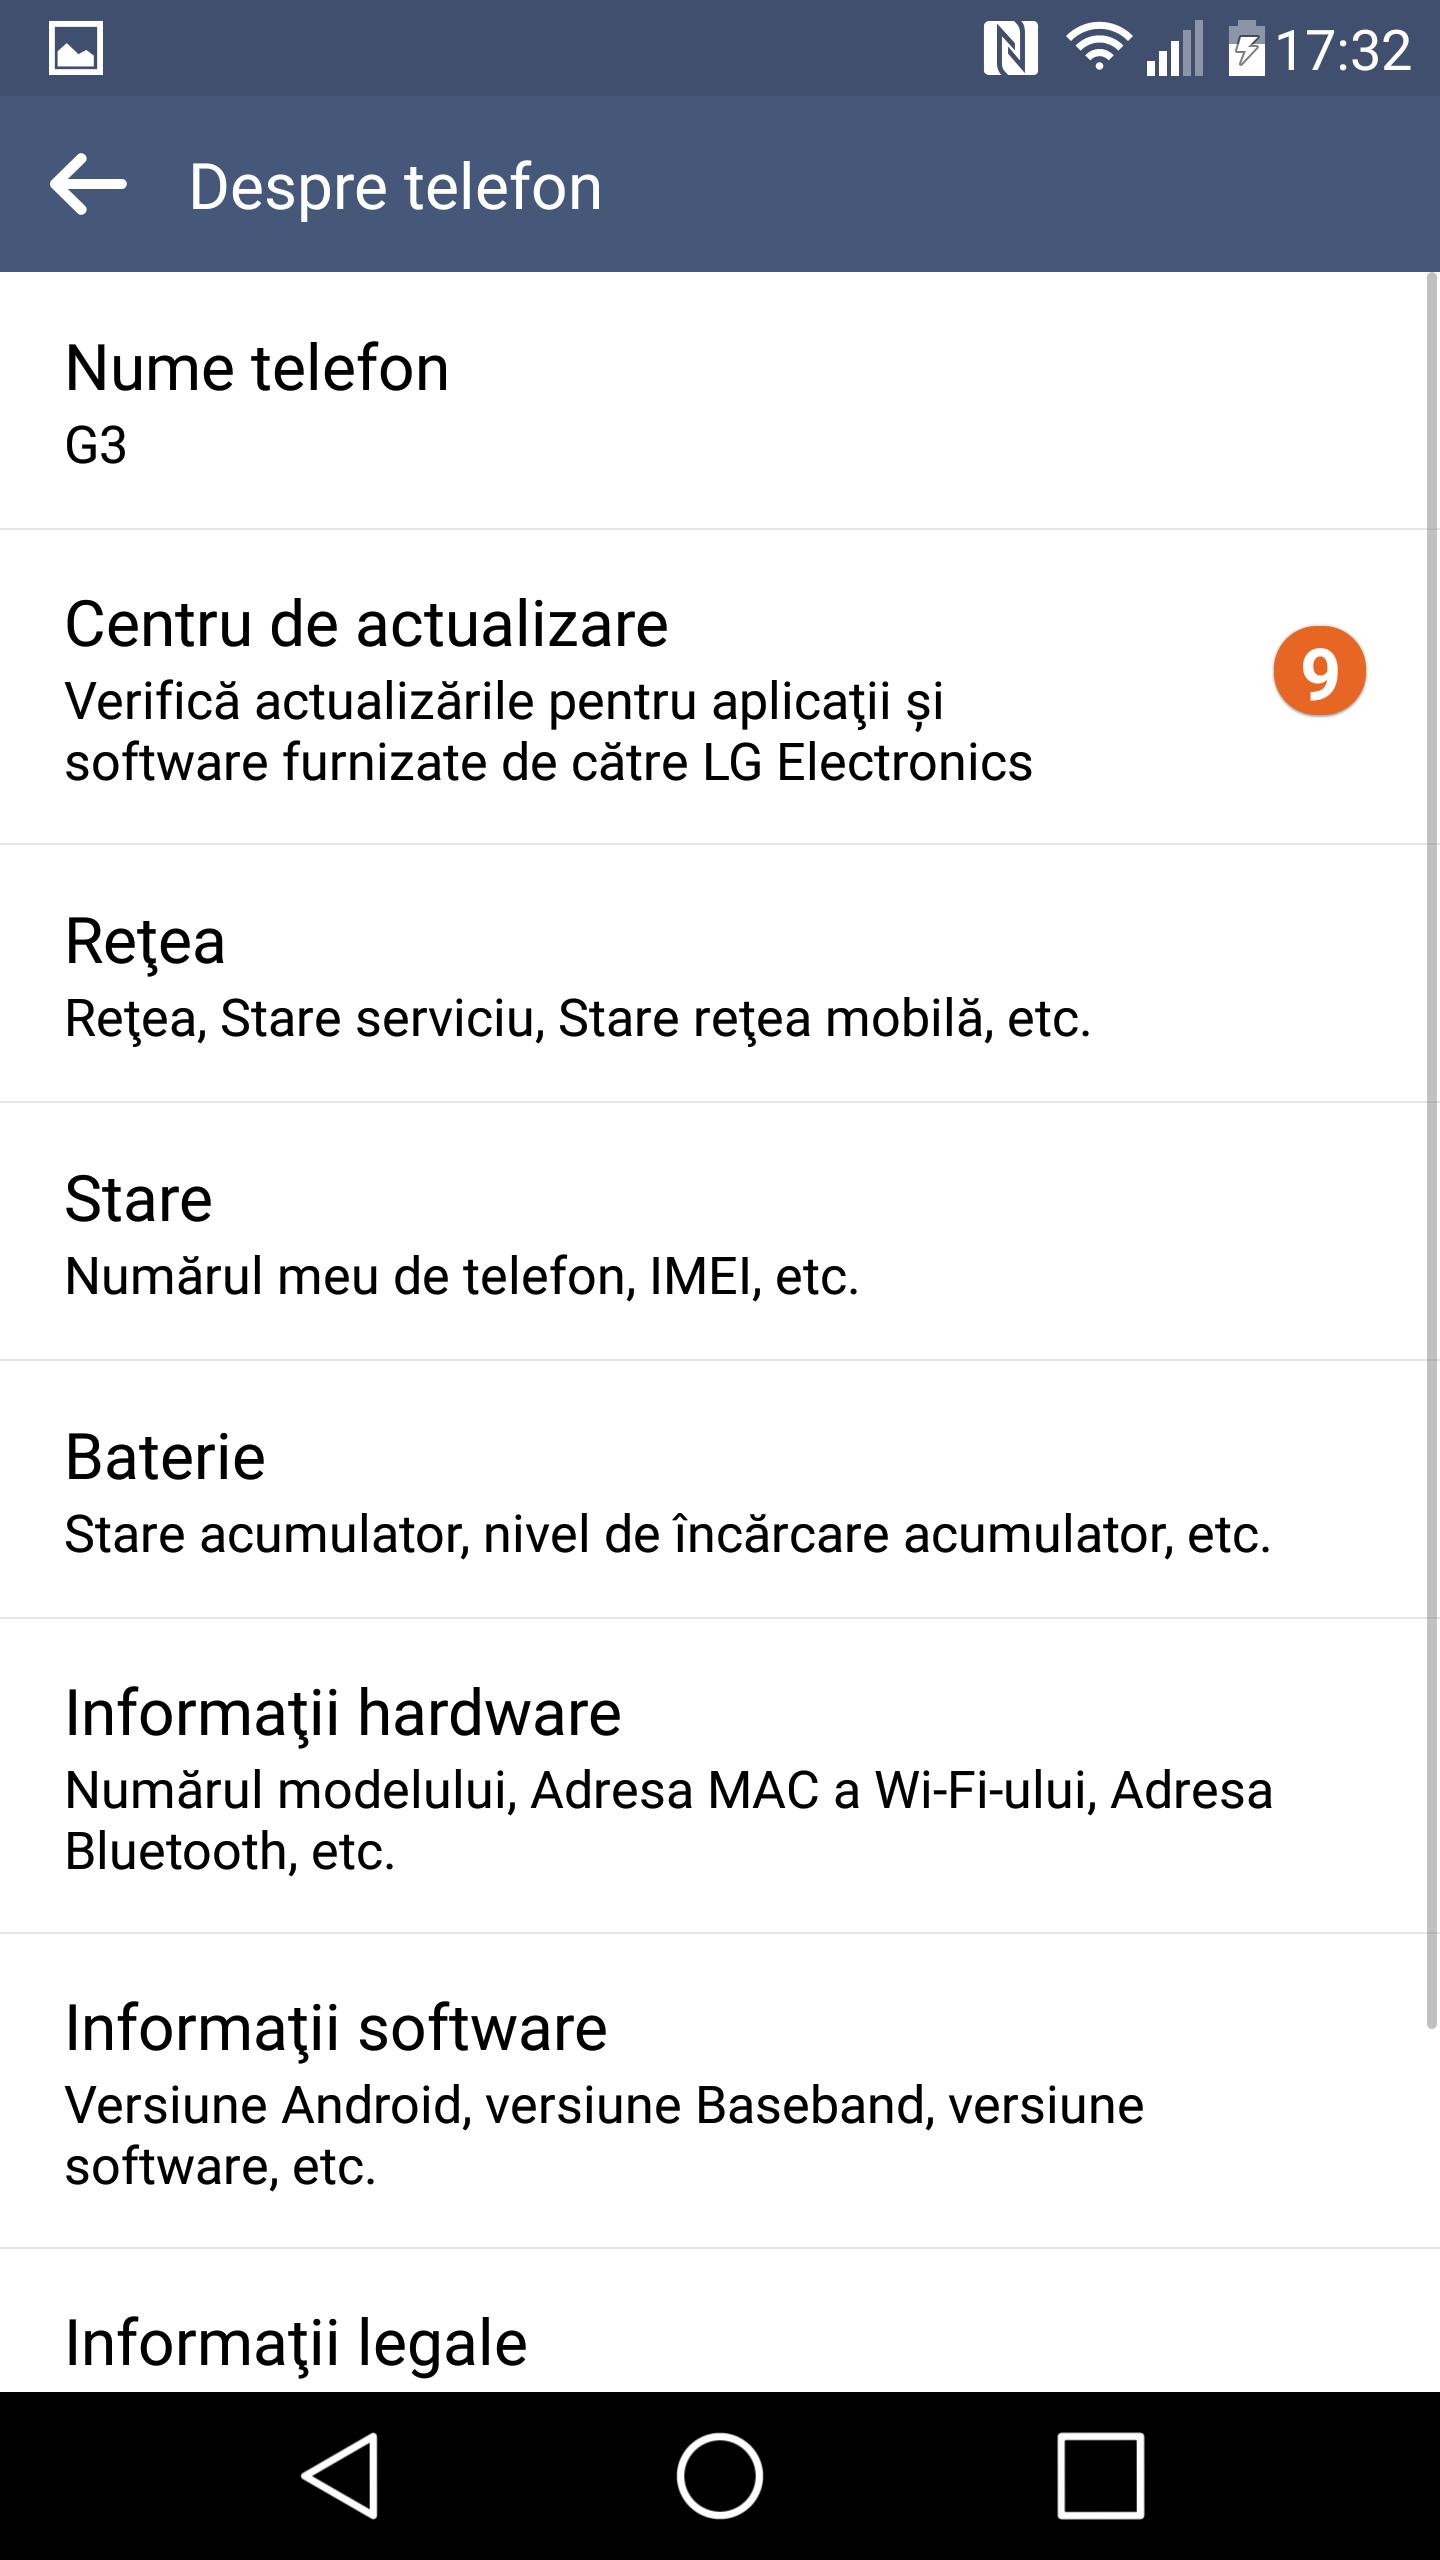 Instalare Android 6 Marshmallow oficial D85530B_00_1217.kdz pe LG G3